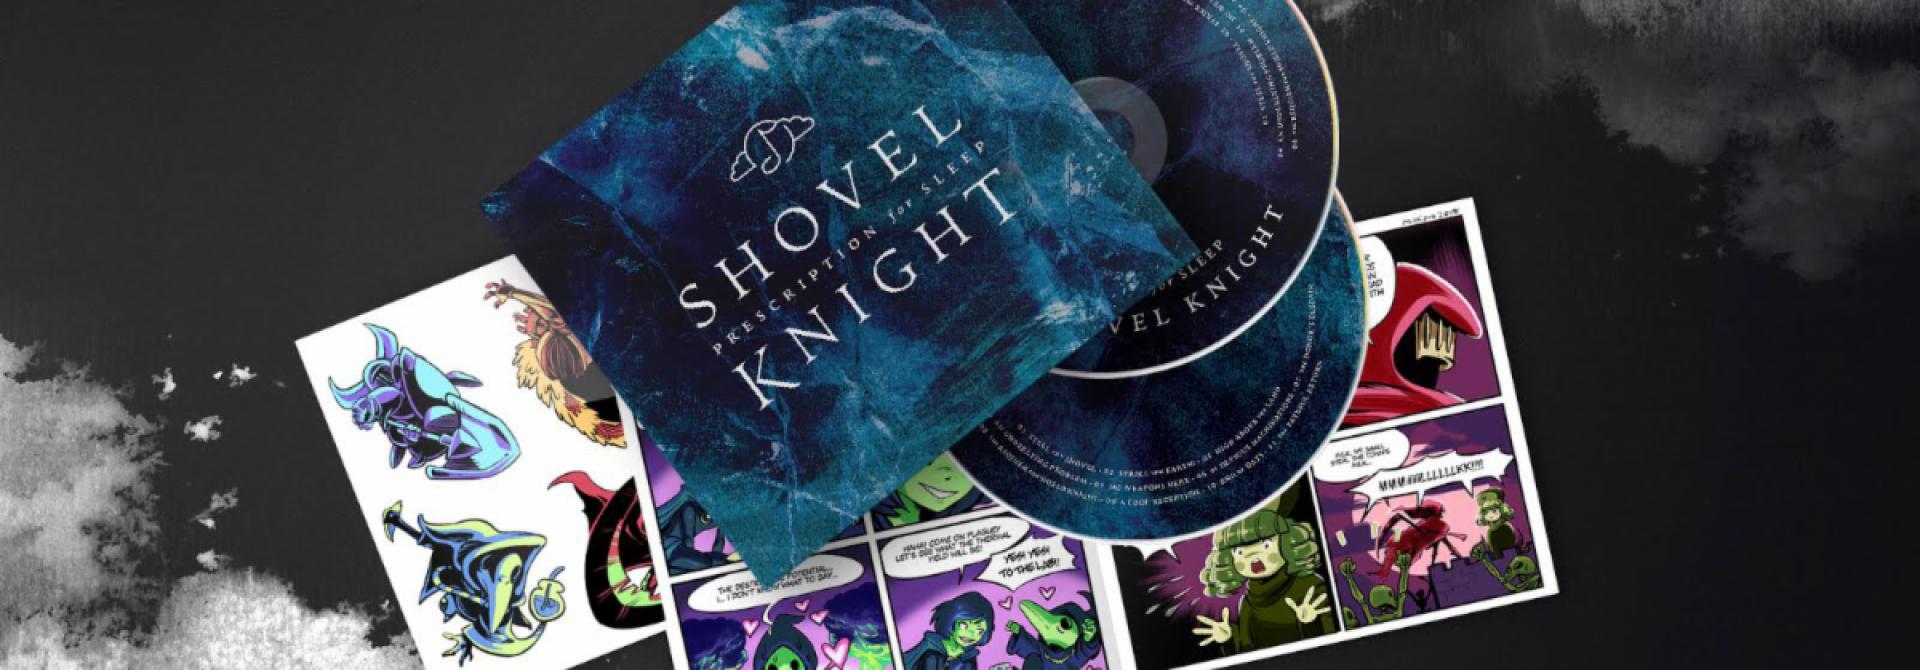 Introducing Shovel Knight's Album Of Jazzy Lullabies